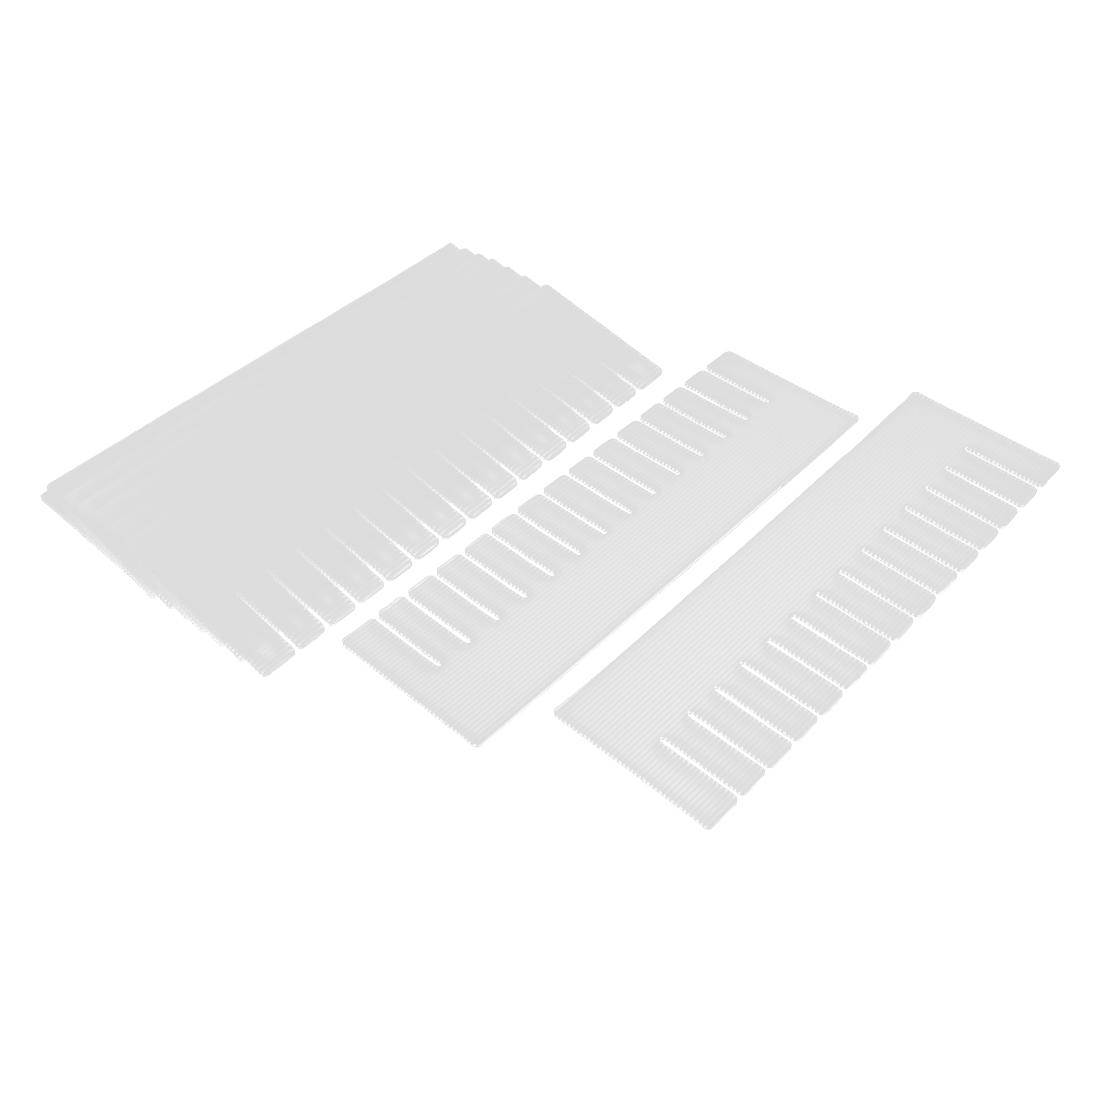 Plastic DIY Grid Drawer Divider Household Necessities Storage Off White 10 Pcs